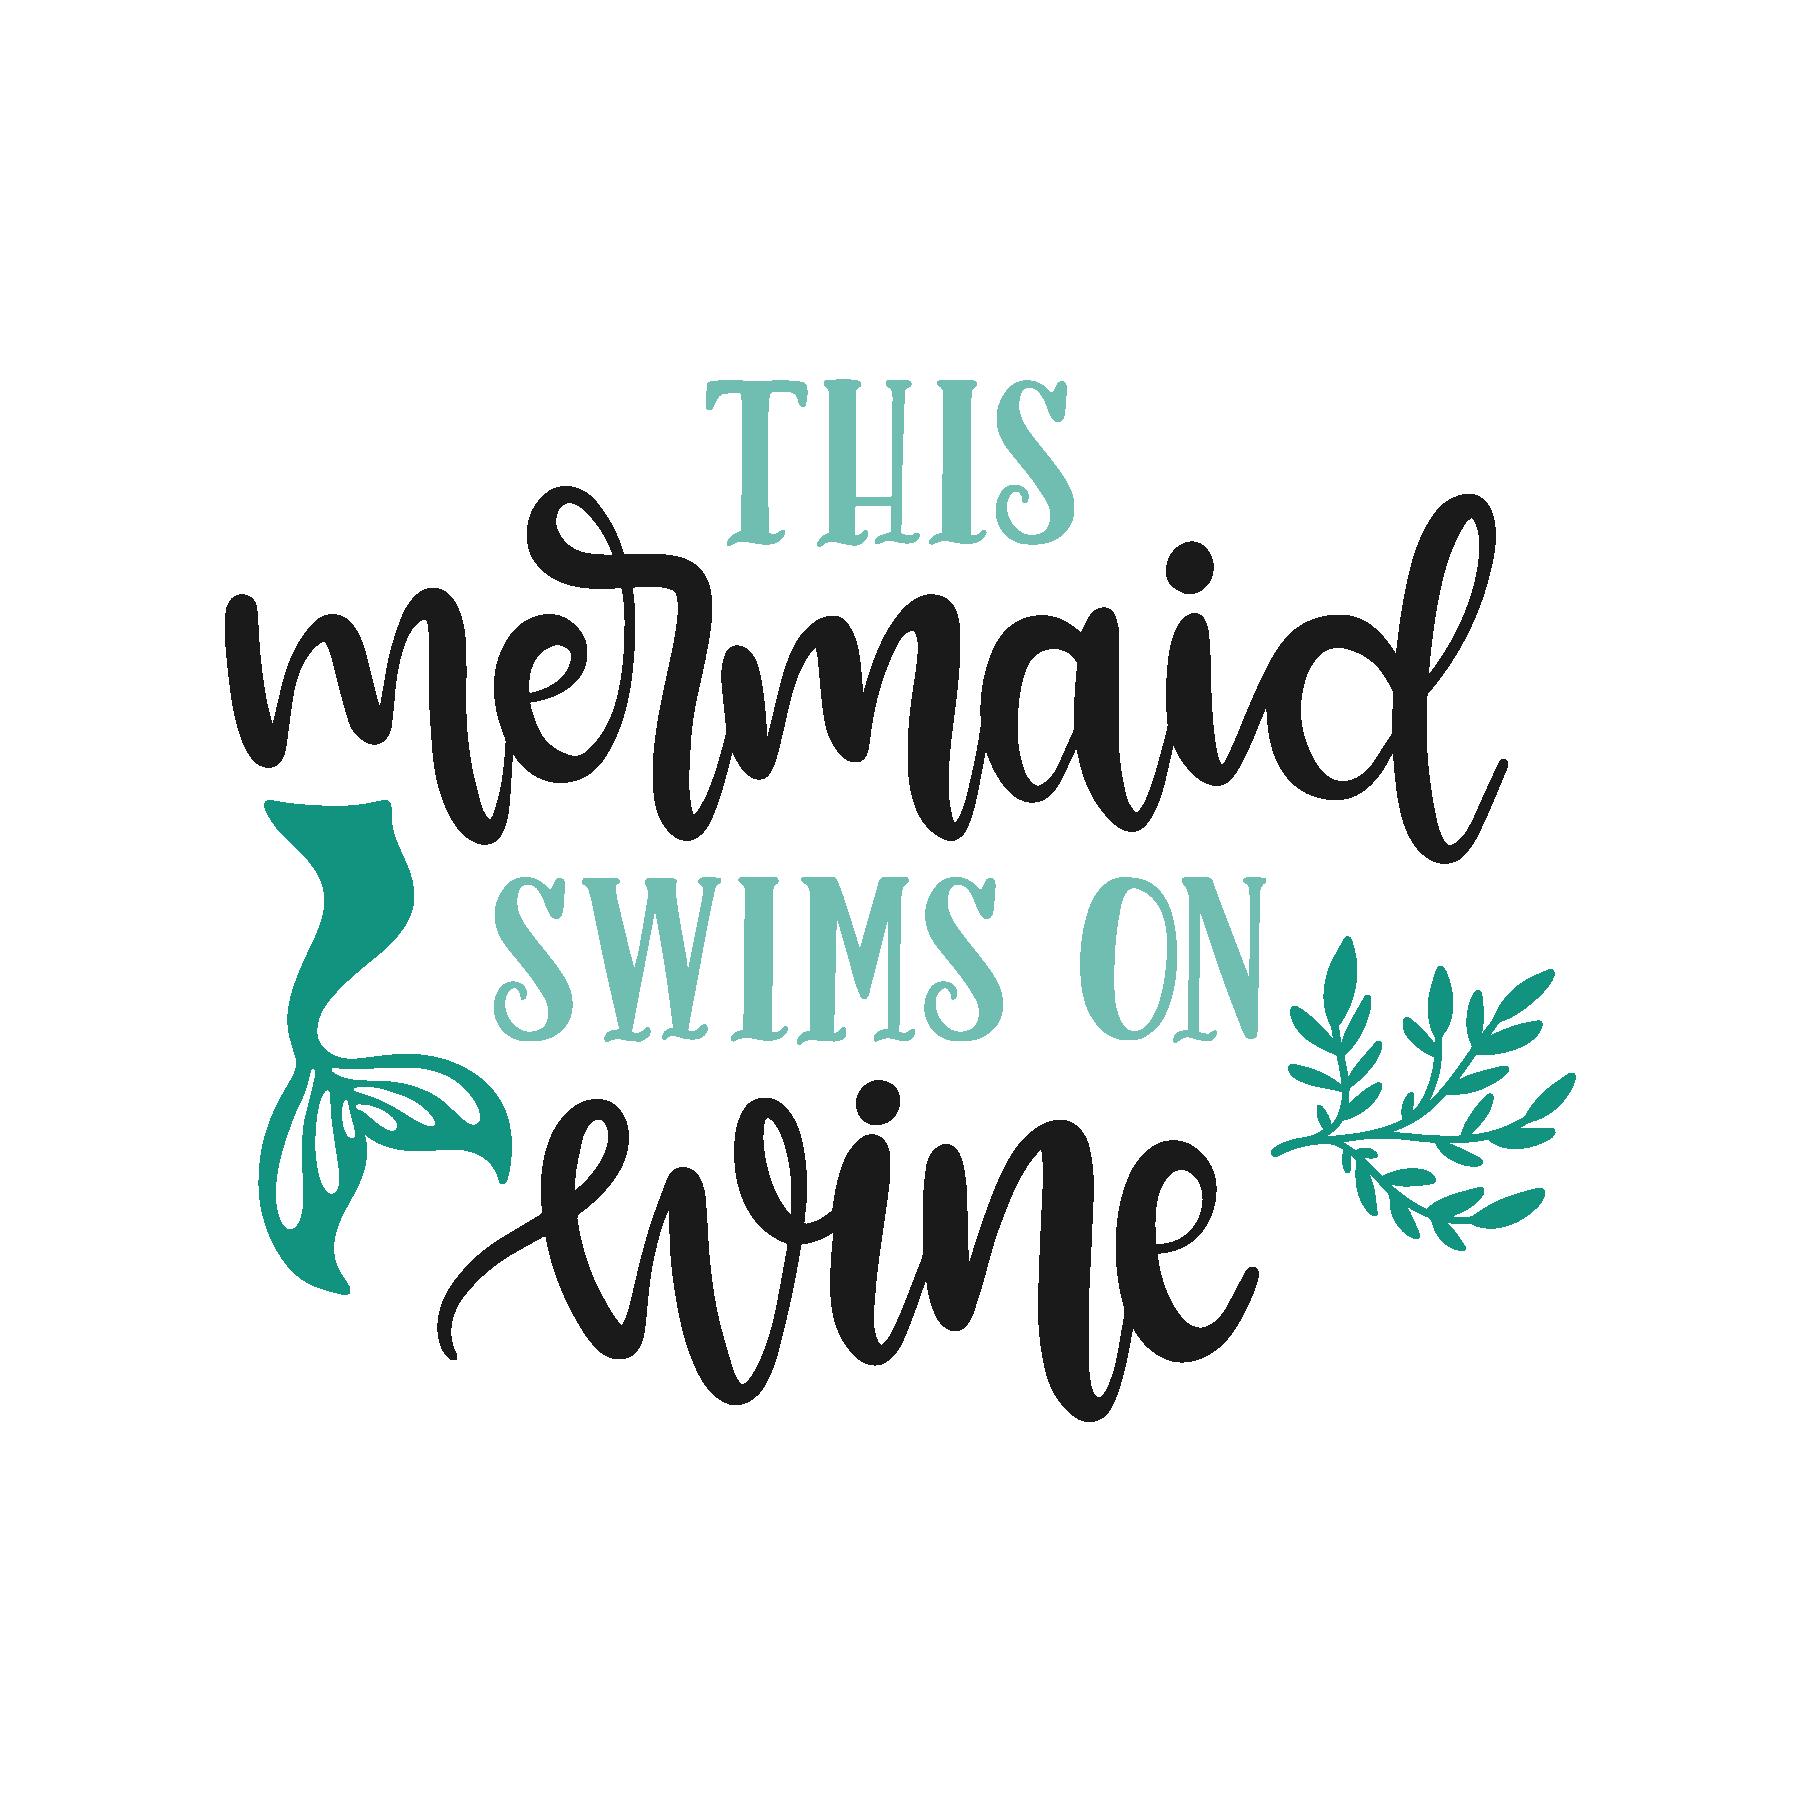 Pin by Krista on LOVE SVG Cricut projects vinyl, Mermaid